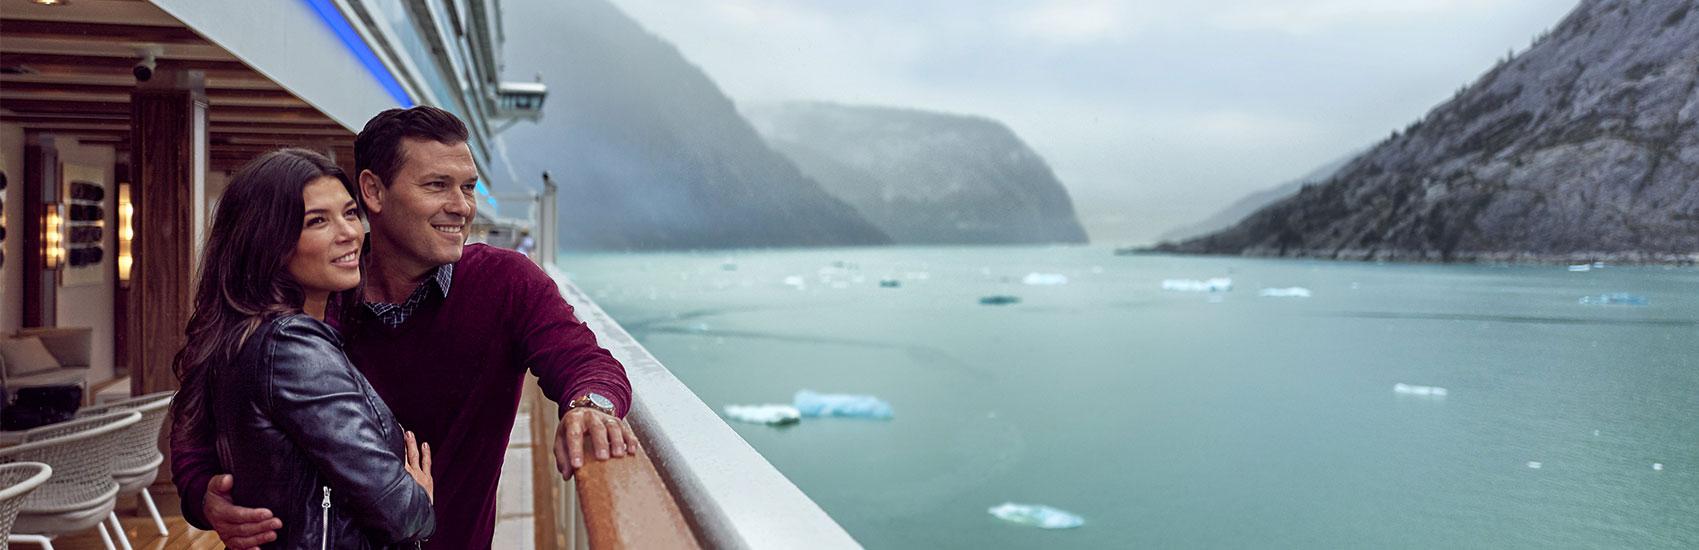 Norwegian Cruise Line's Free at Sea 1